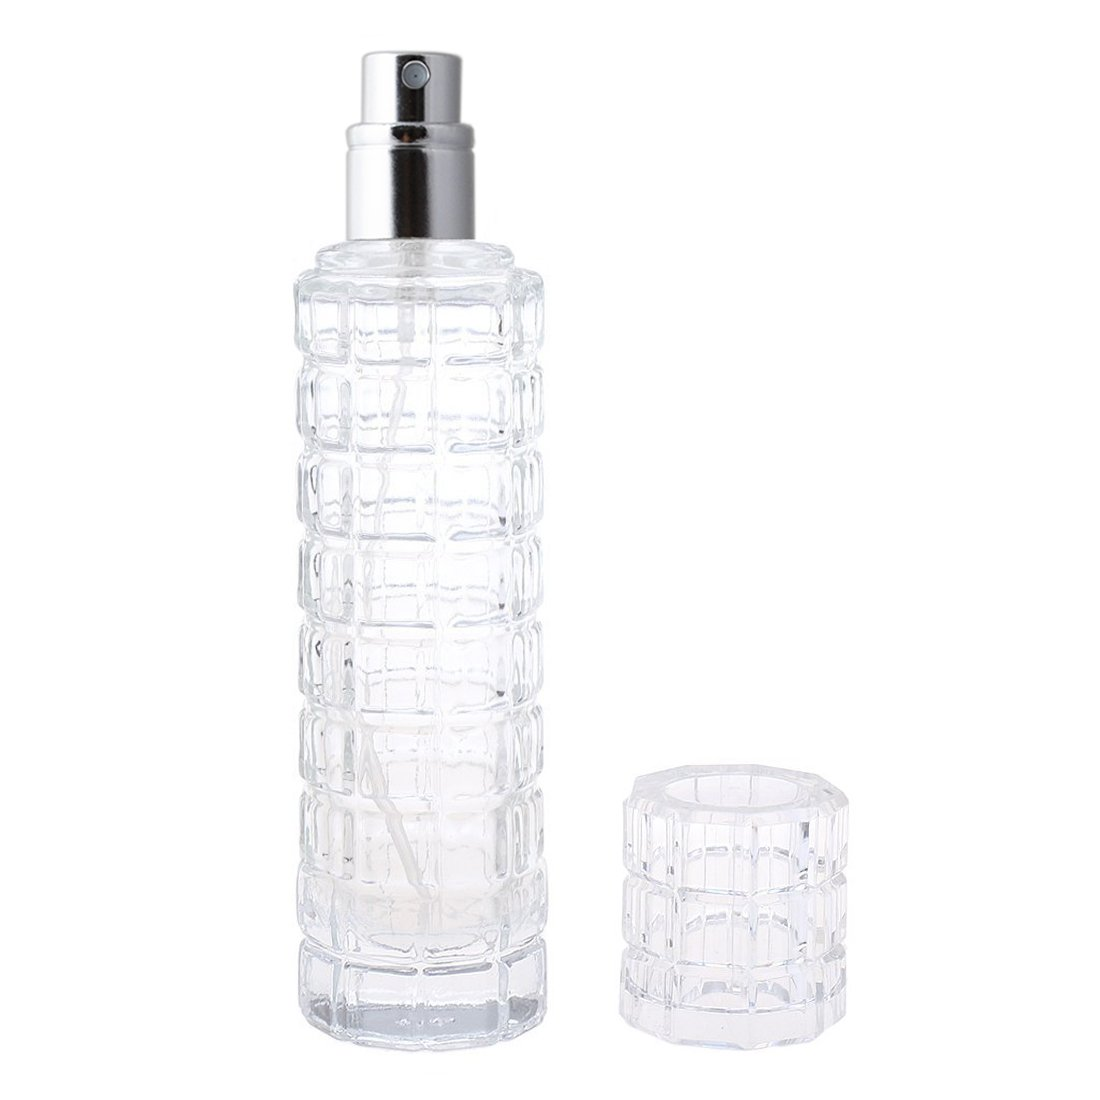 Enslz 30ML Empty Clear Glass Spray Bottles Refillable DIY Blends Perfume Atomizer Replacement Silver Sprayer